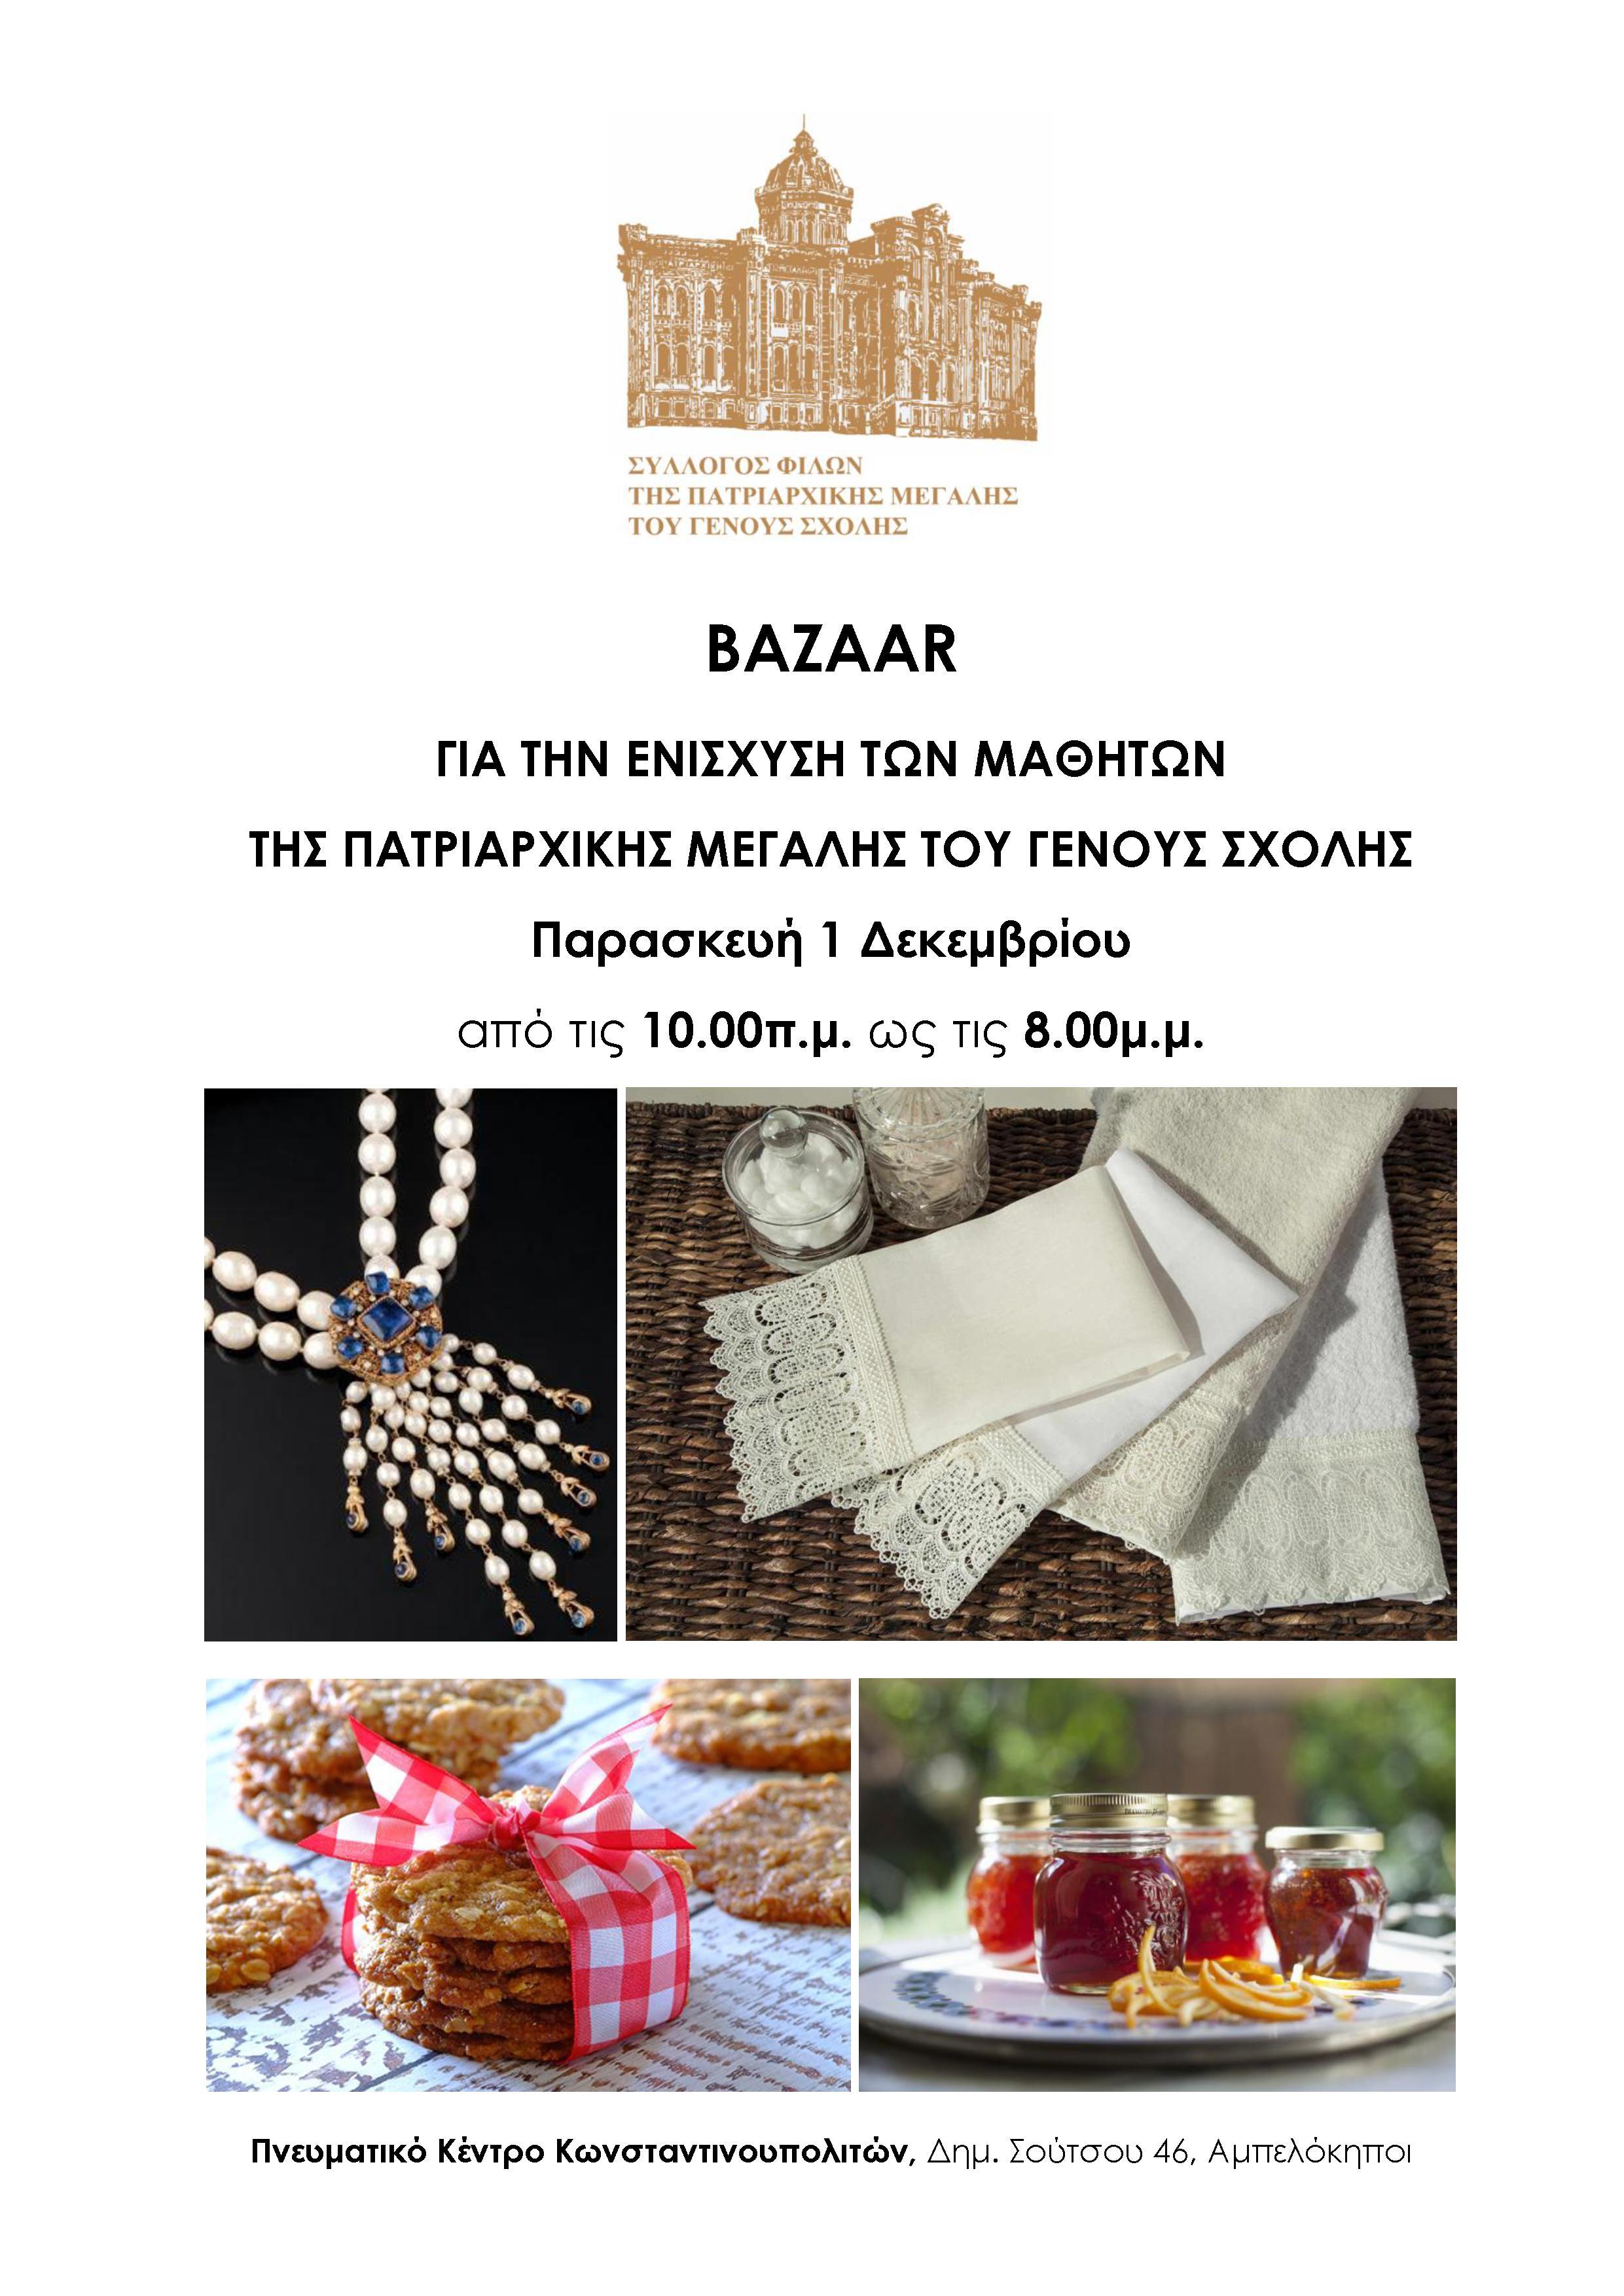 BAZAAR_2017_ΑΦΙΣΑ - Αντιγραφή